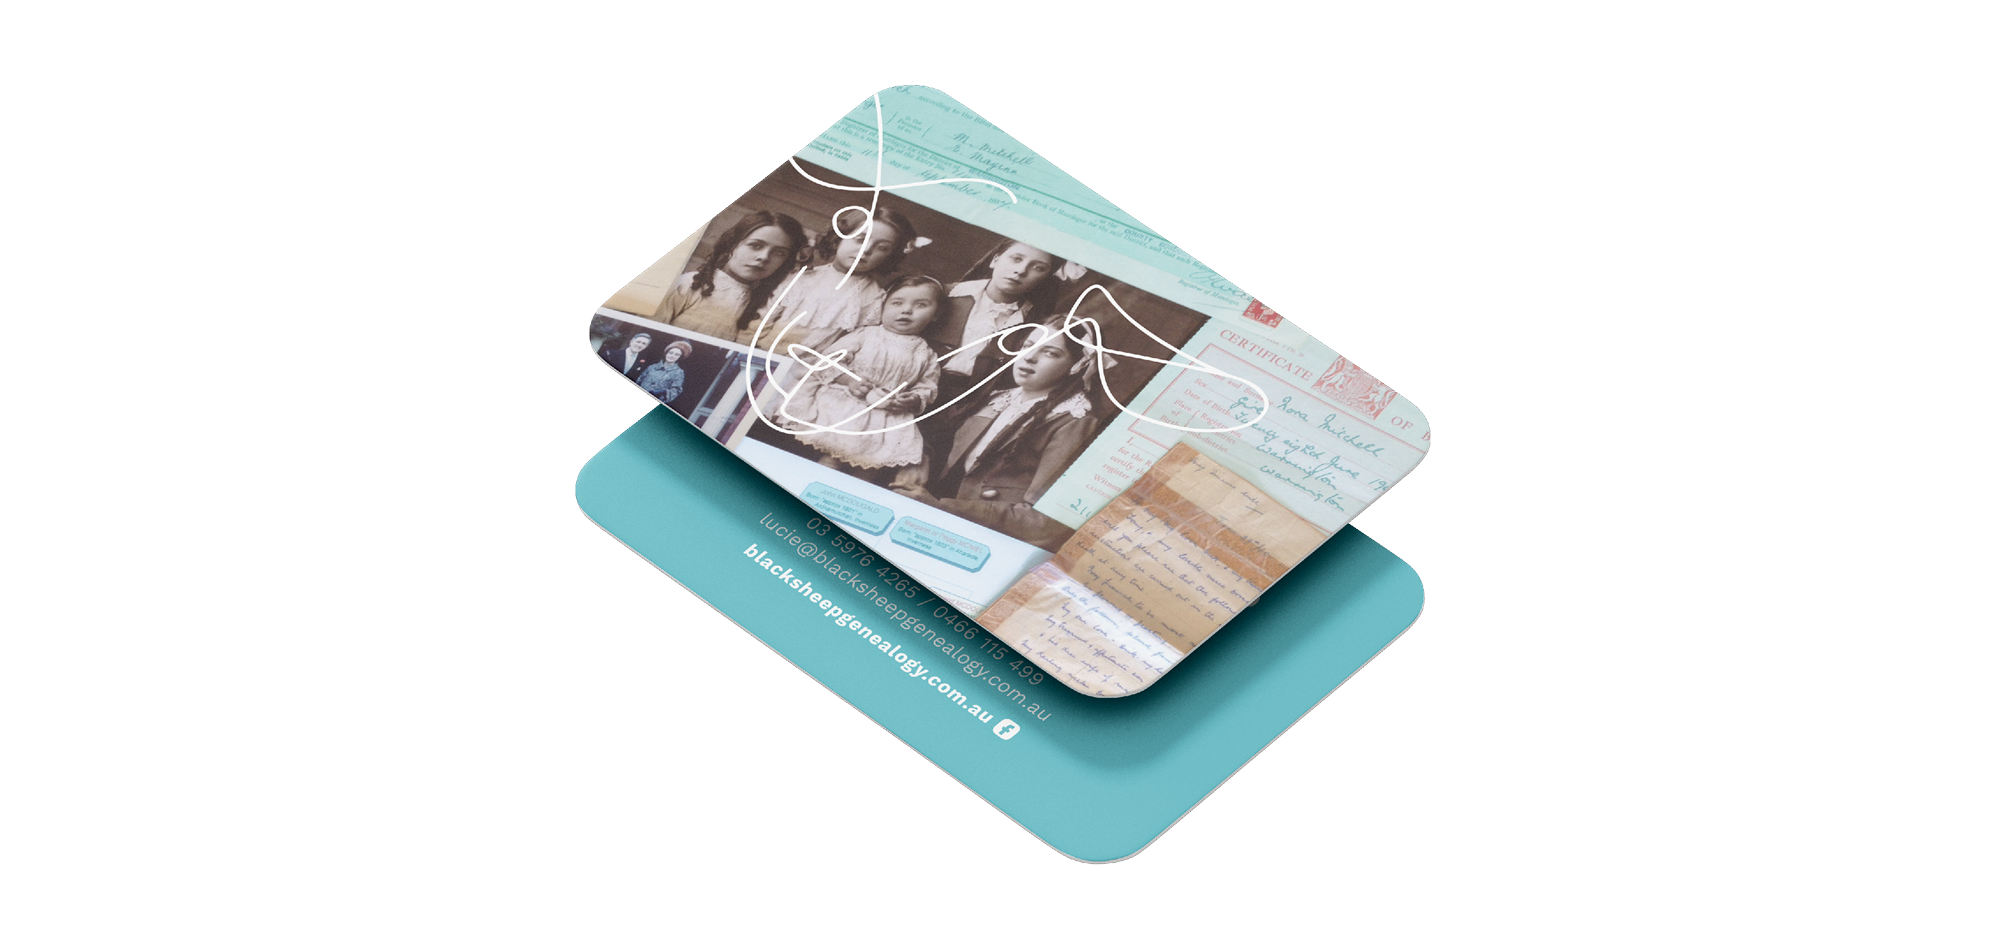 Black-Sheep-Genealogy-branding-business-card-design-Grendesign-5